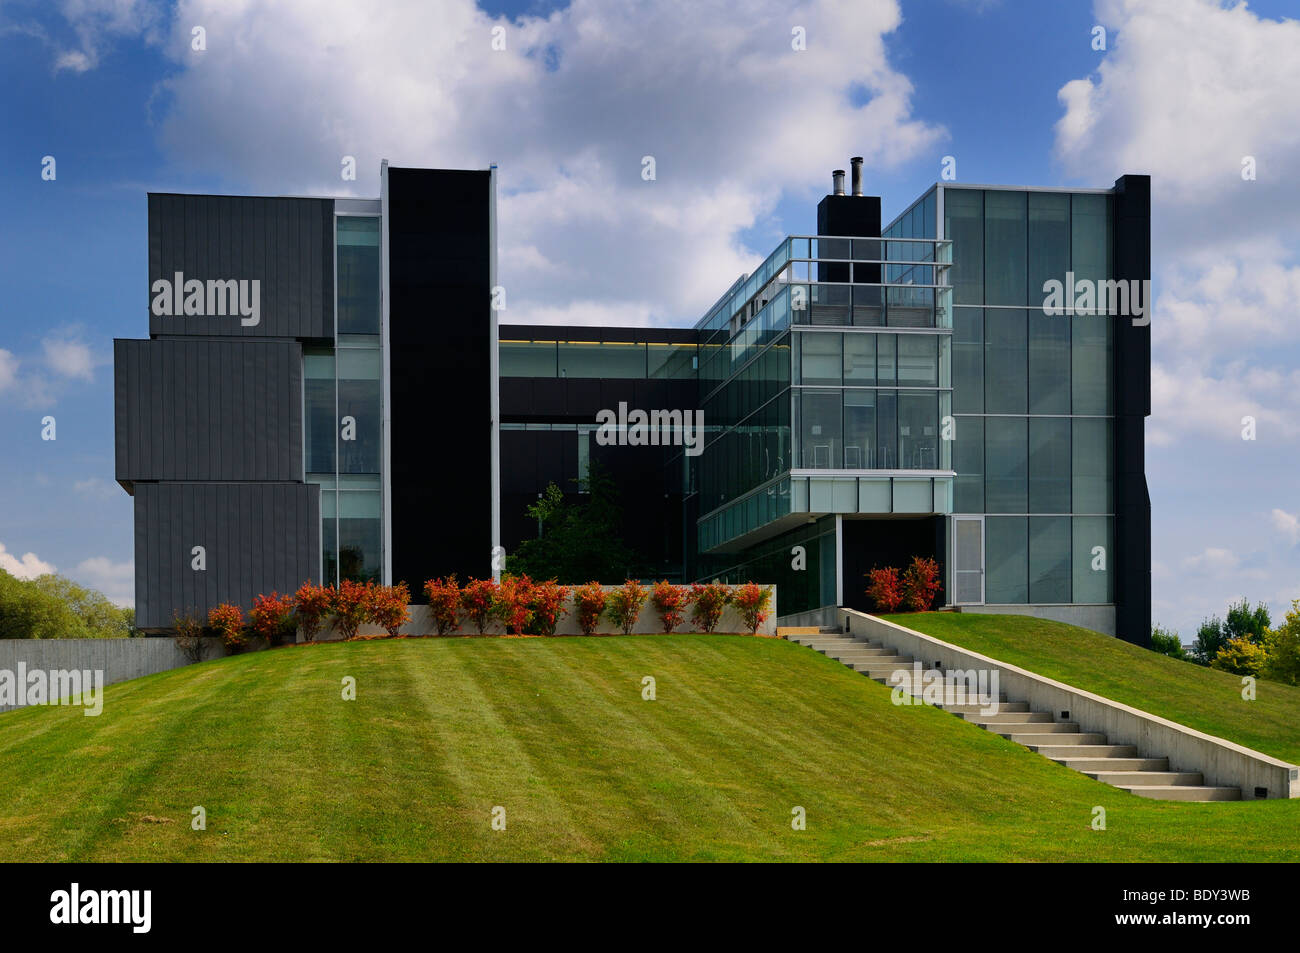 Arquitectura moderna en la parte frontal del edificio de física teórica Perimeter Institute kitchener Imagen De Stock